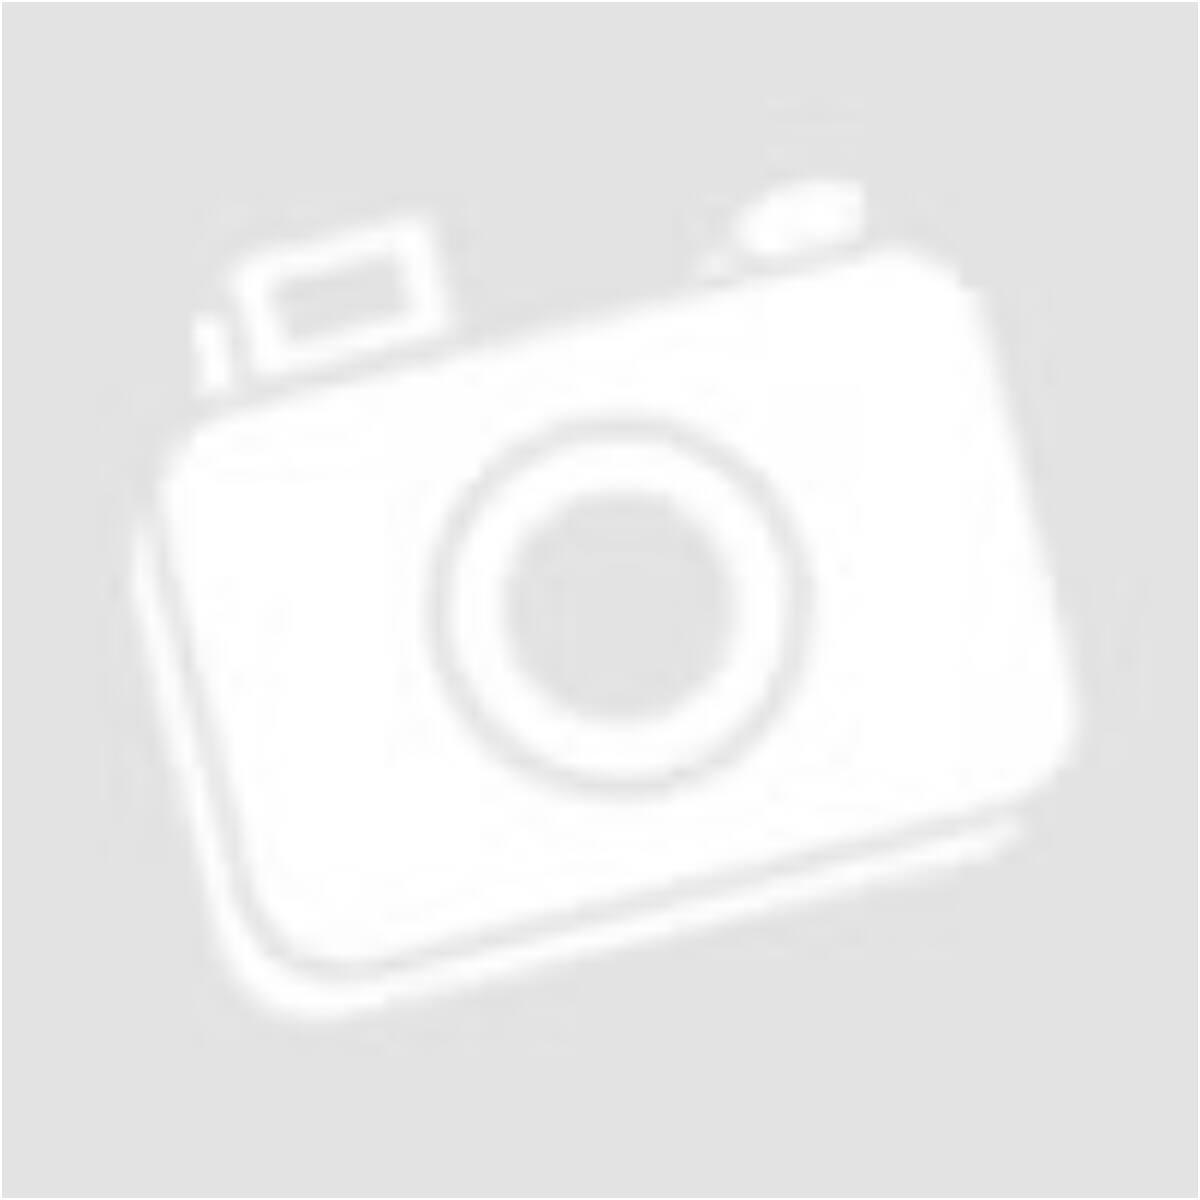 c229a80df4 Tripla gallérú, rövid ujjú slim fit ing #2926 - kék - Rövid ujjú ingek